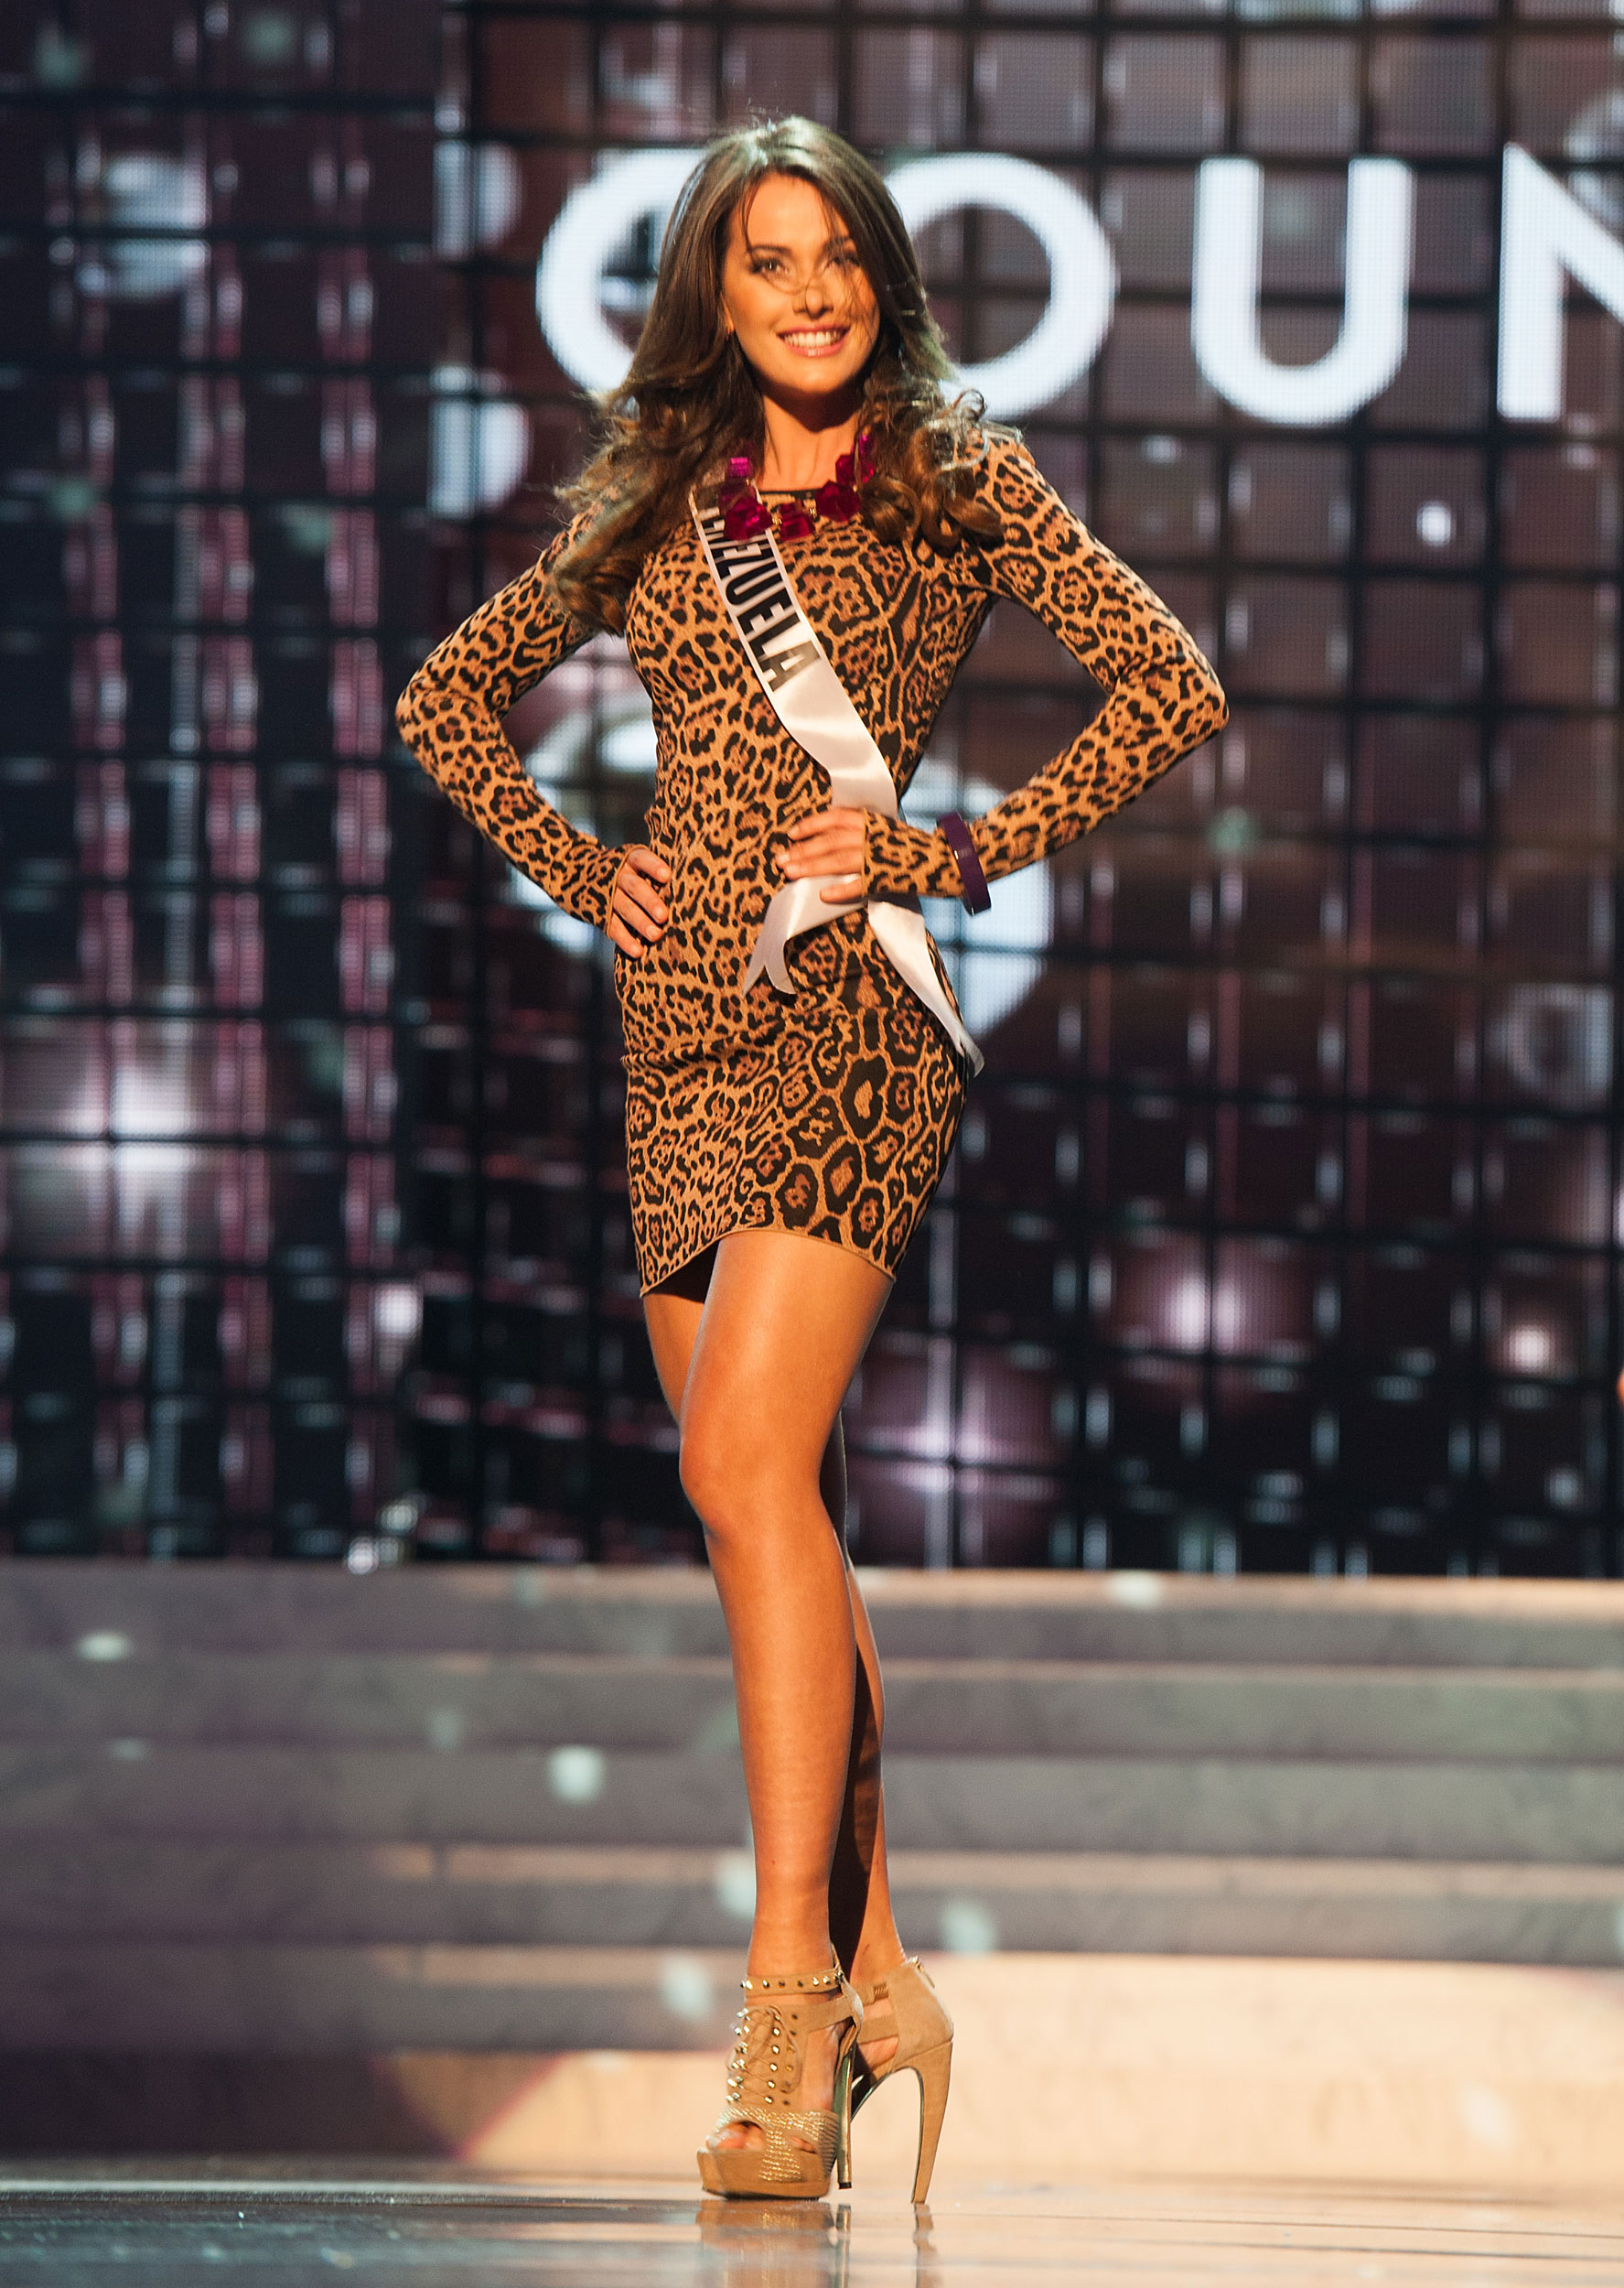 Miss Venezuela 2011 Irene Esser